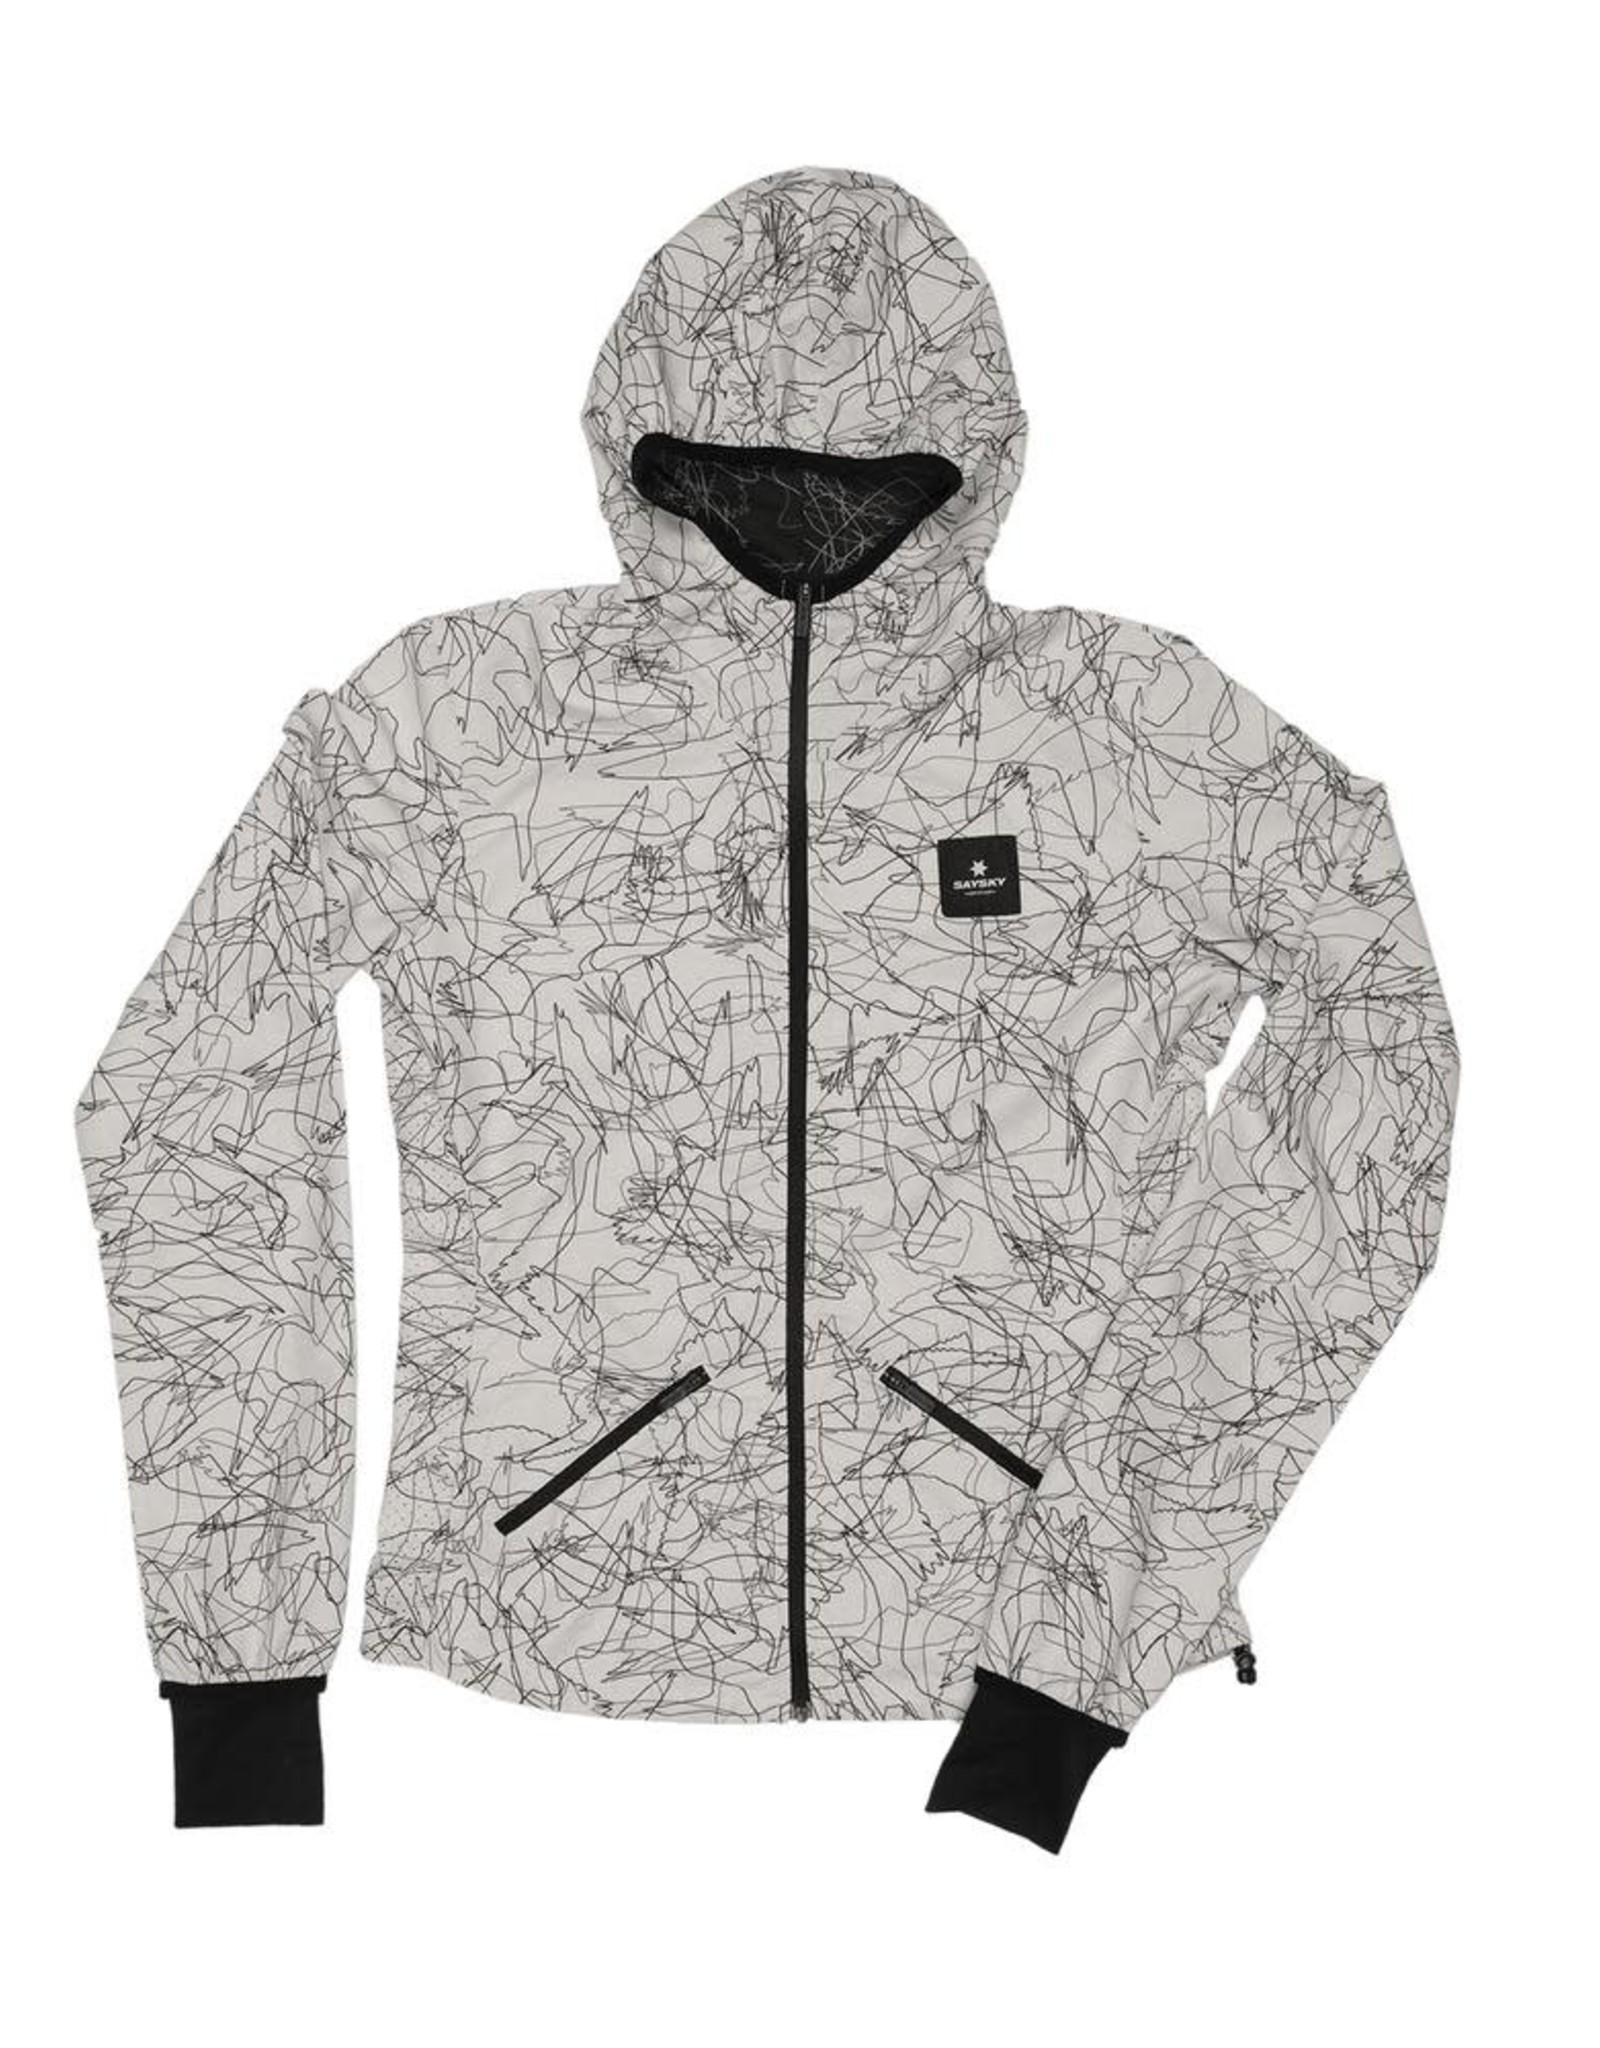 Saysky DGRJA01 Wmns Falcon Hooded jacket